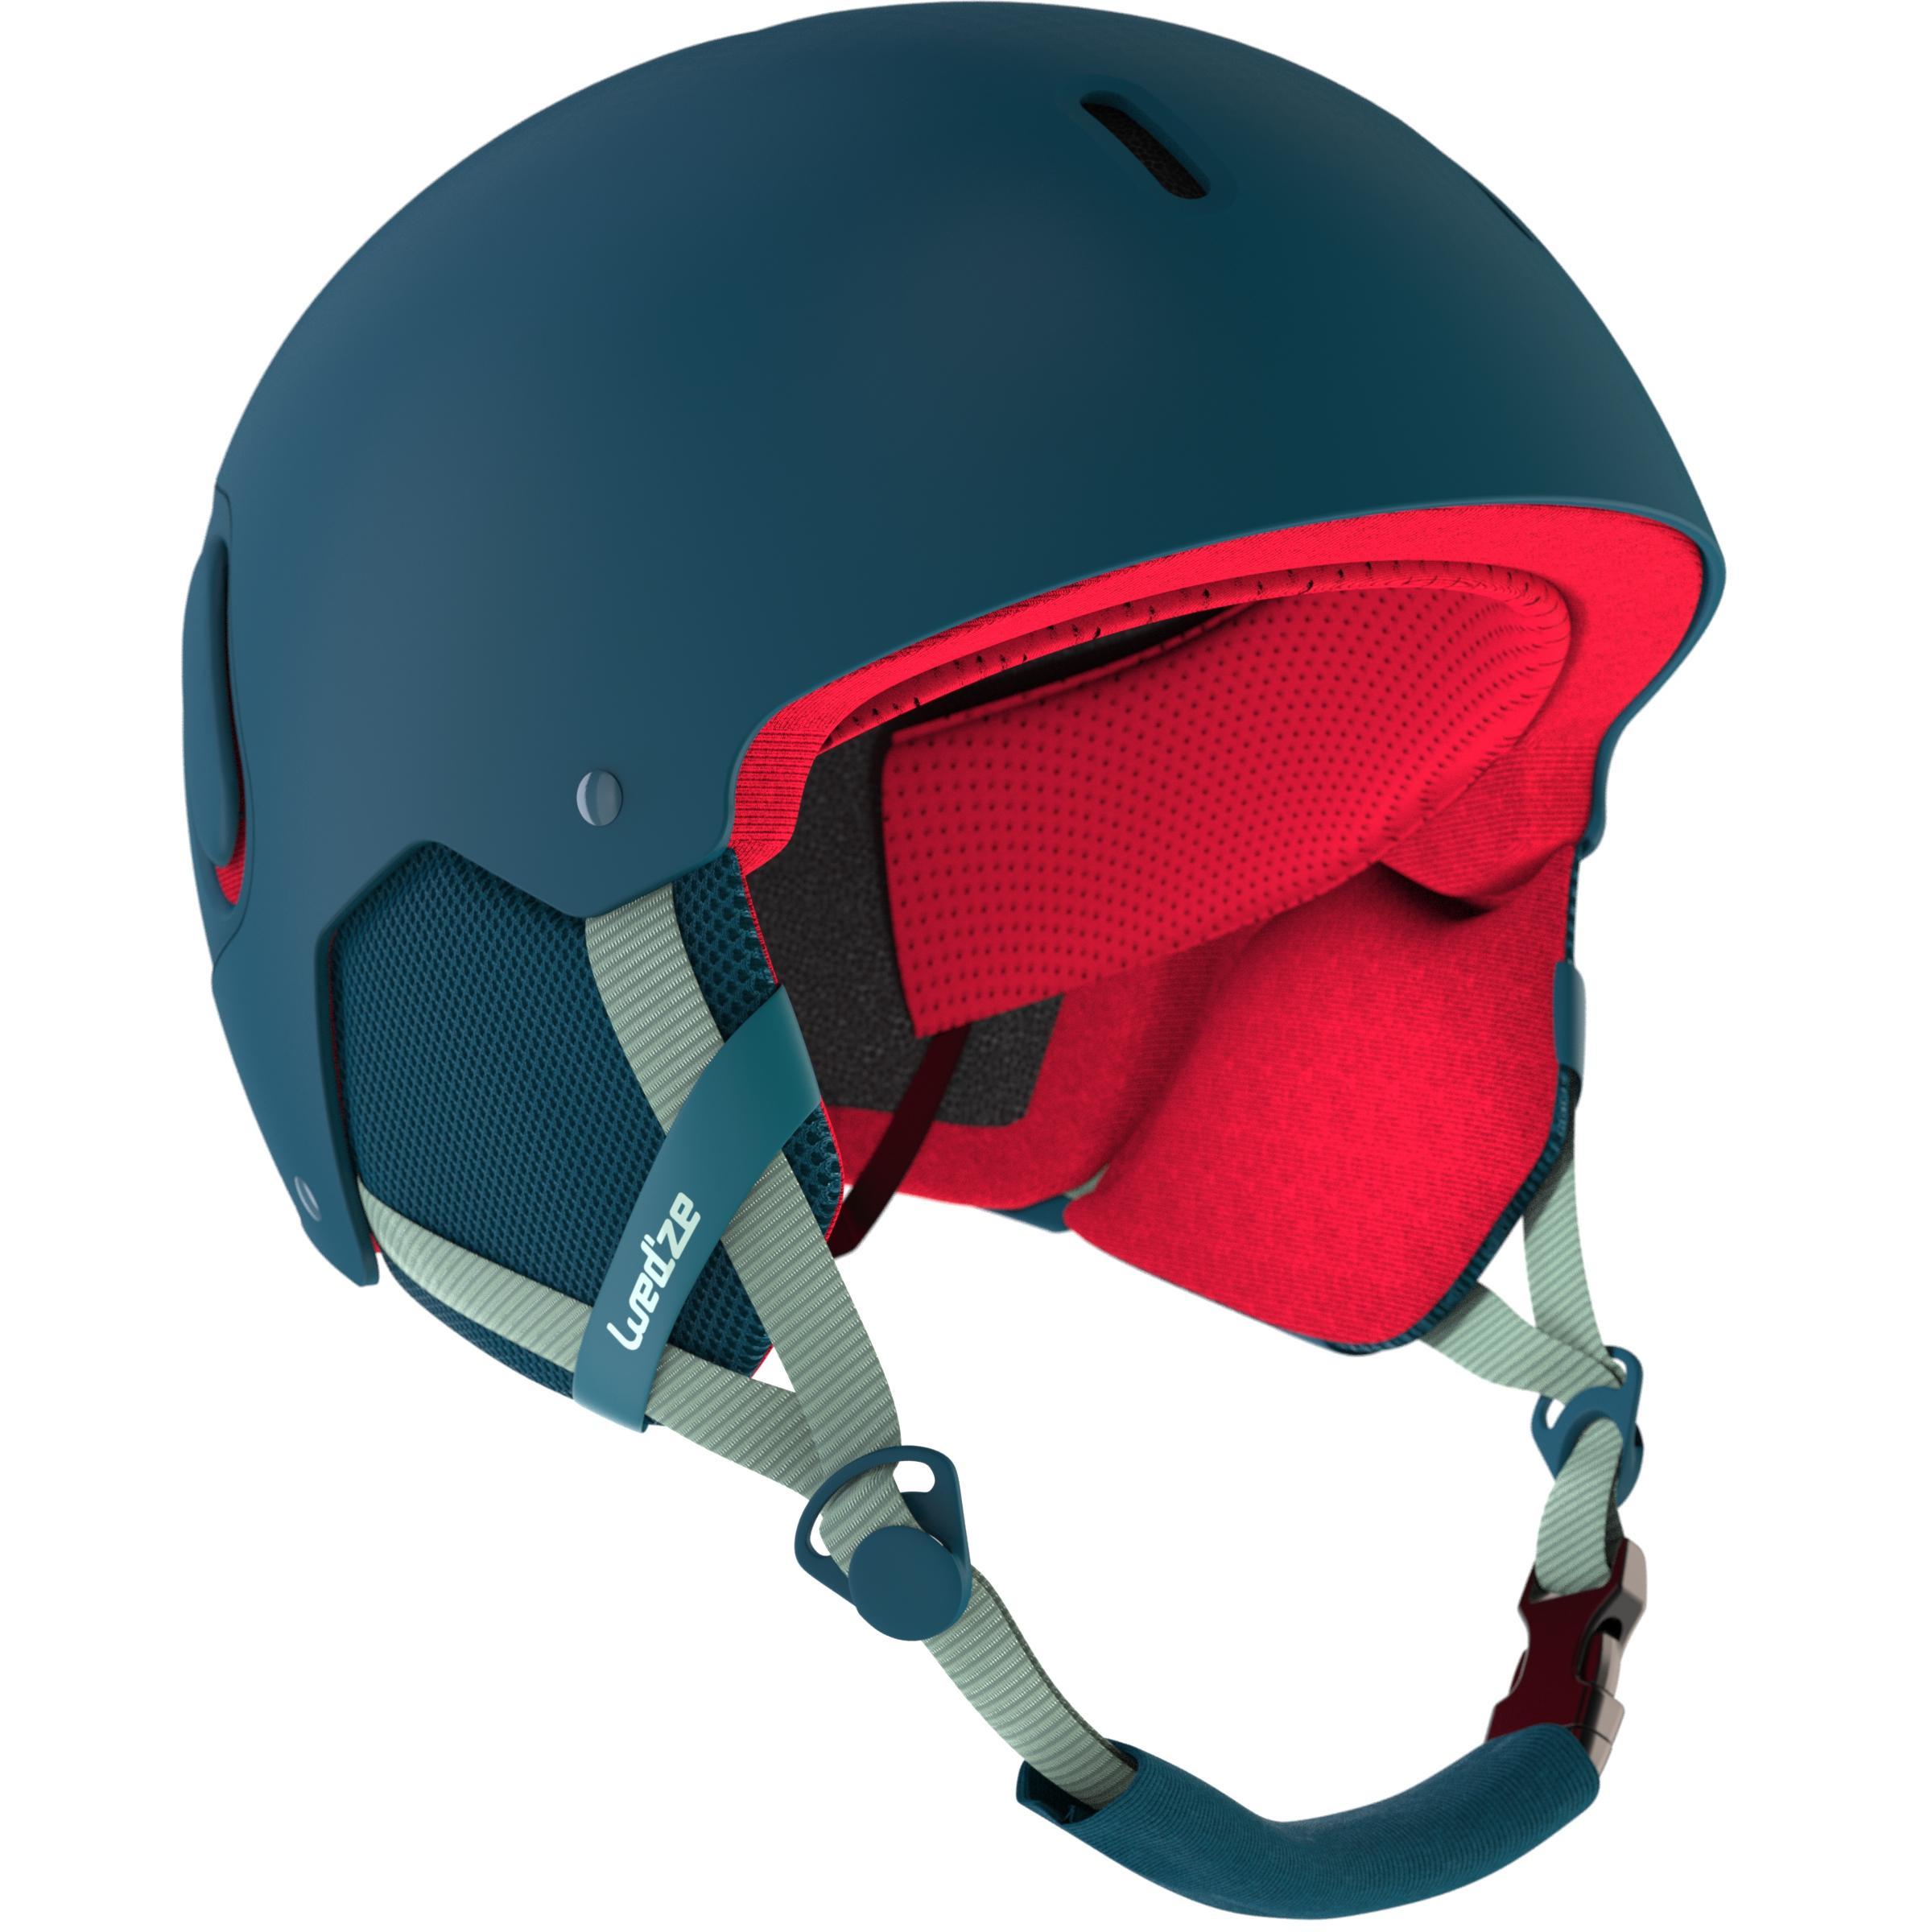 Casque de ski et de snowboard enfant Feel 400 JR